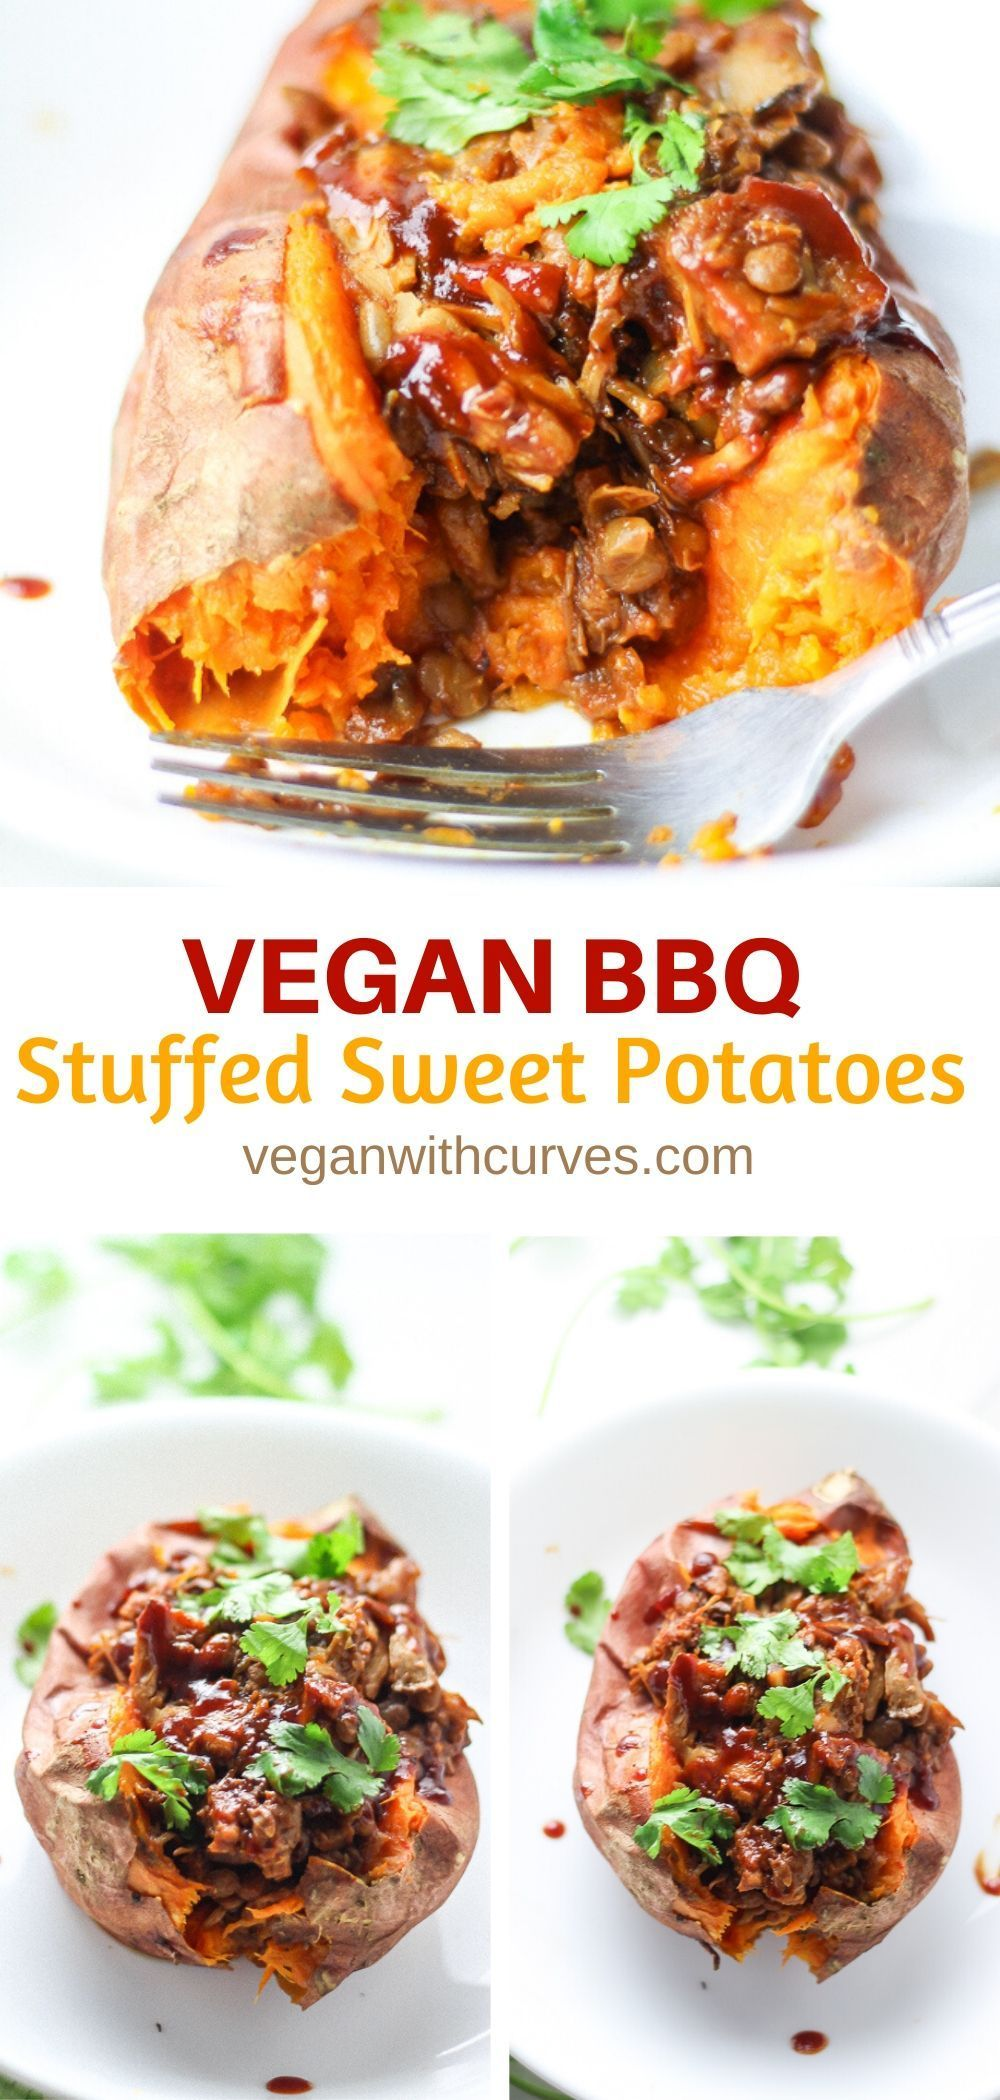 Bbq Vegan Stuffed Sweet Potatoes Recipe In 2020 Vegan Lunch Recipes Vegan Dinner Recipes Bbq Recipes